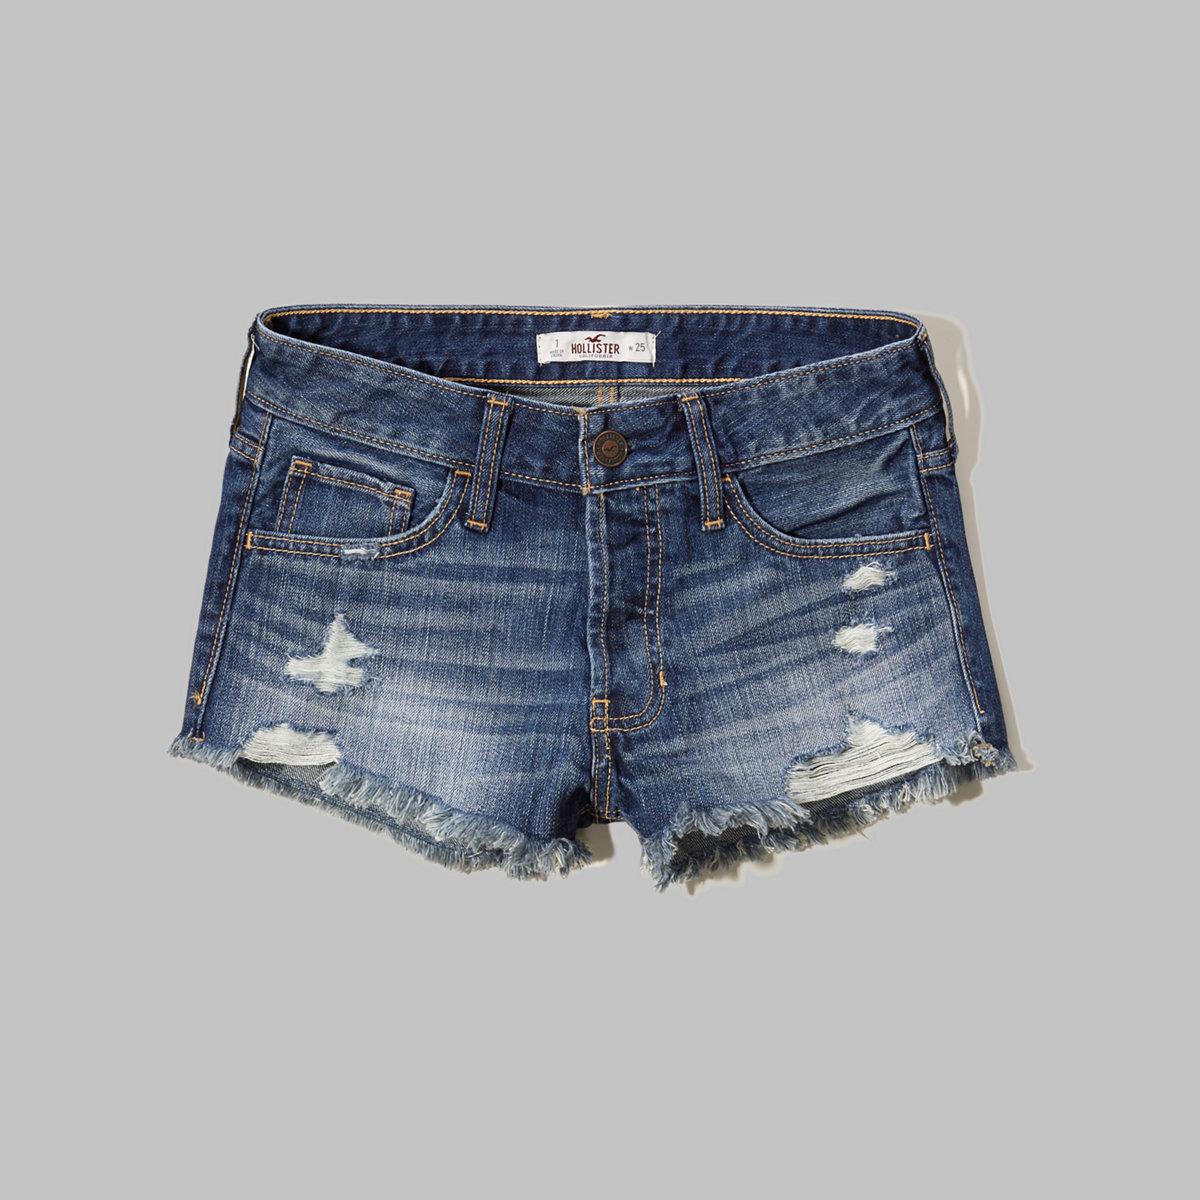 Hollister Low Rise Boyfriend Denim Shorts